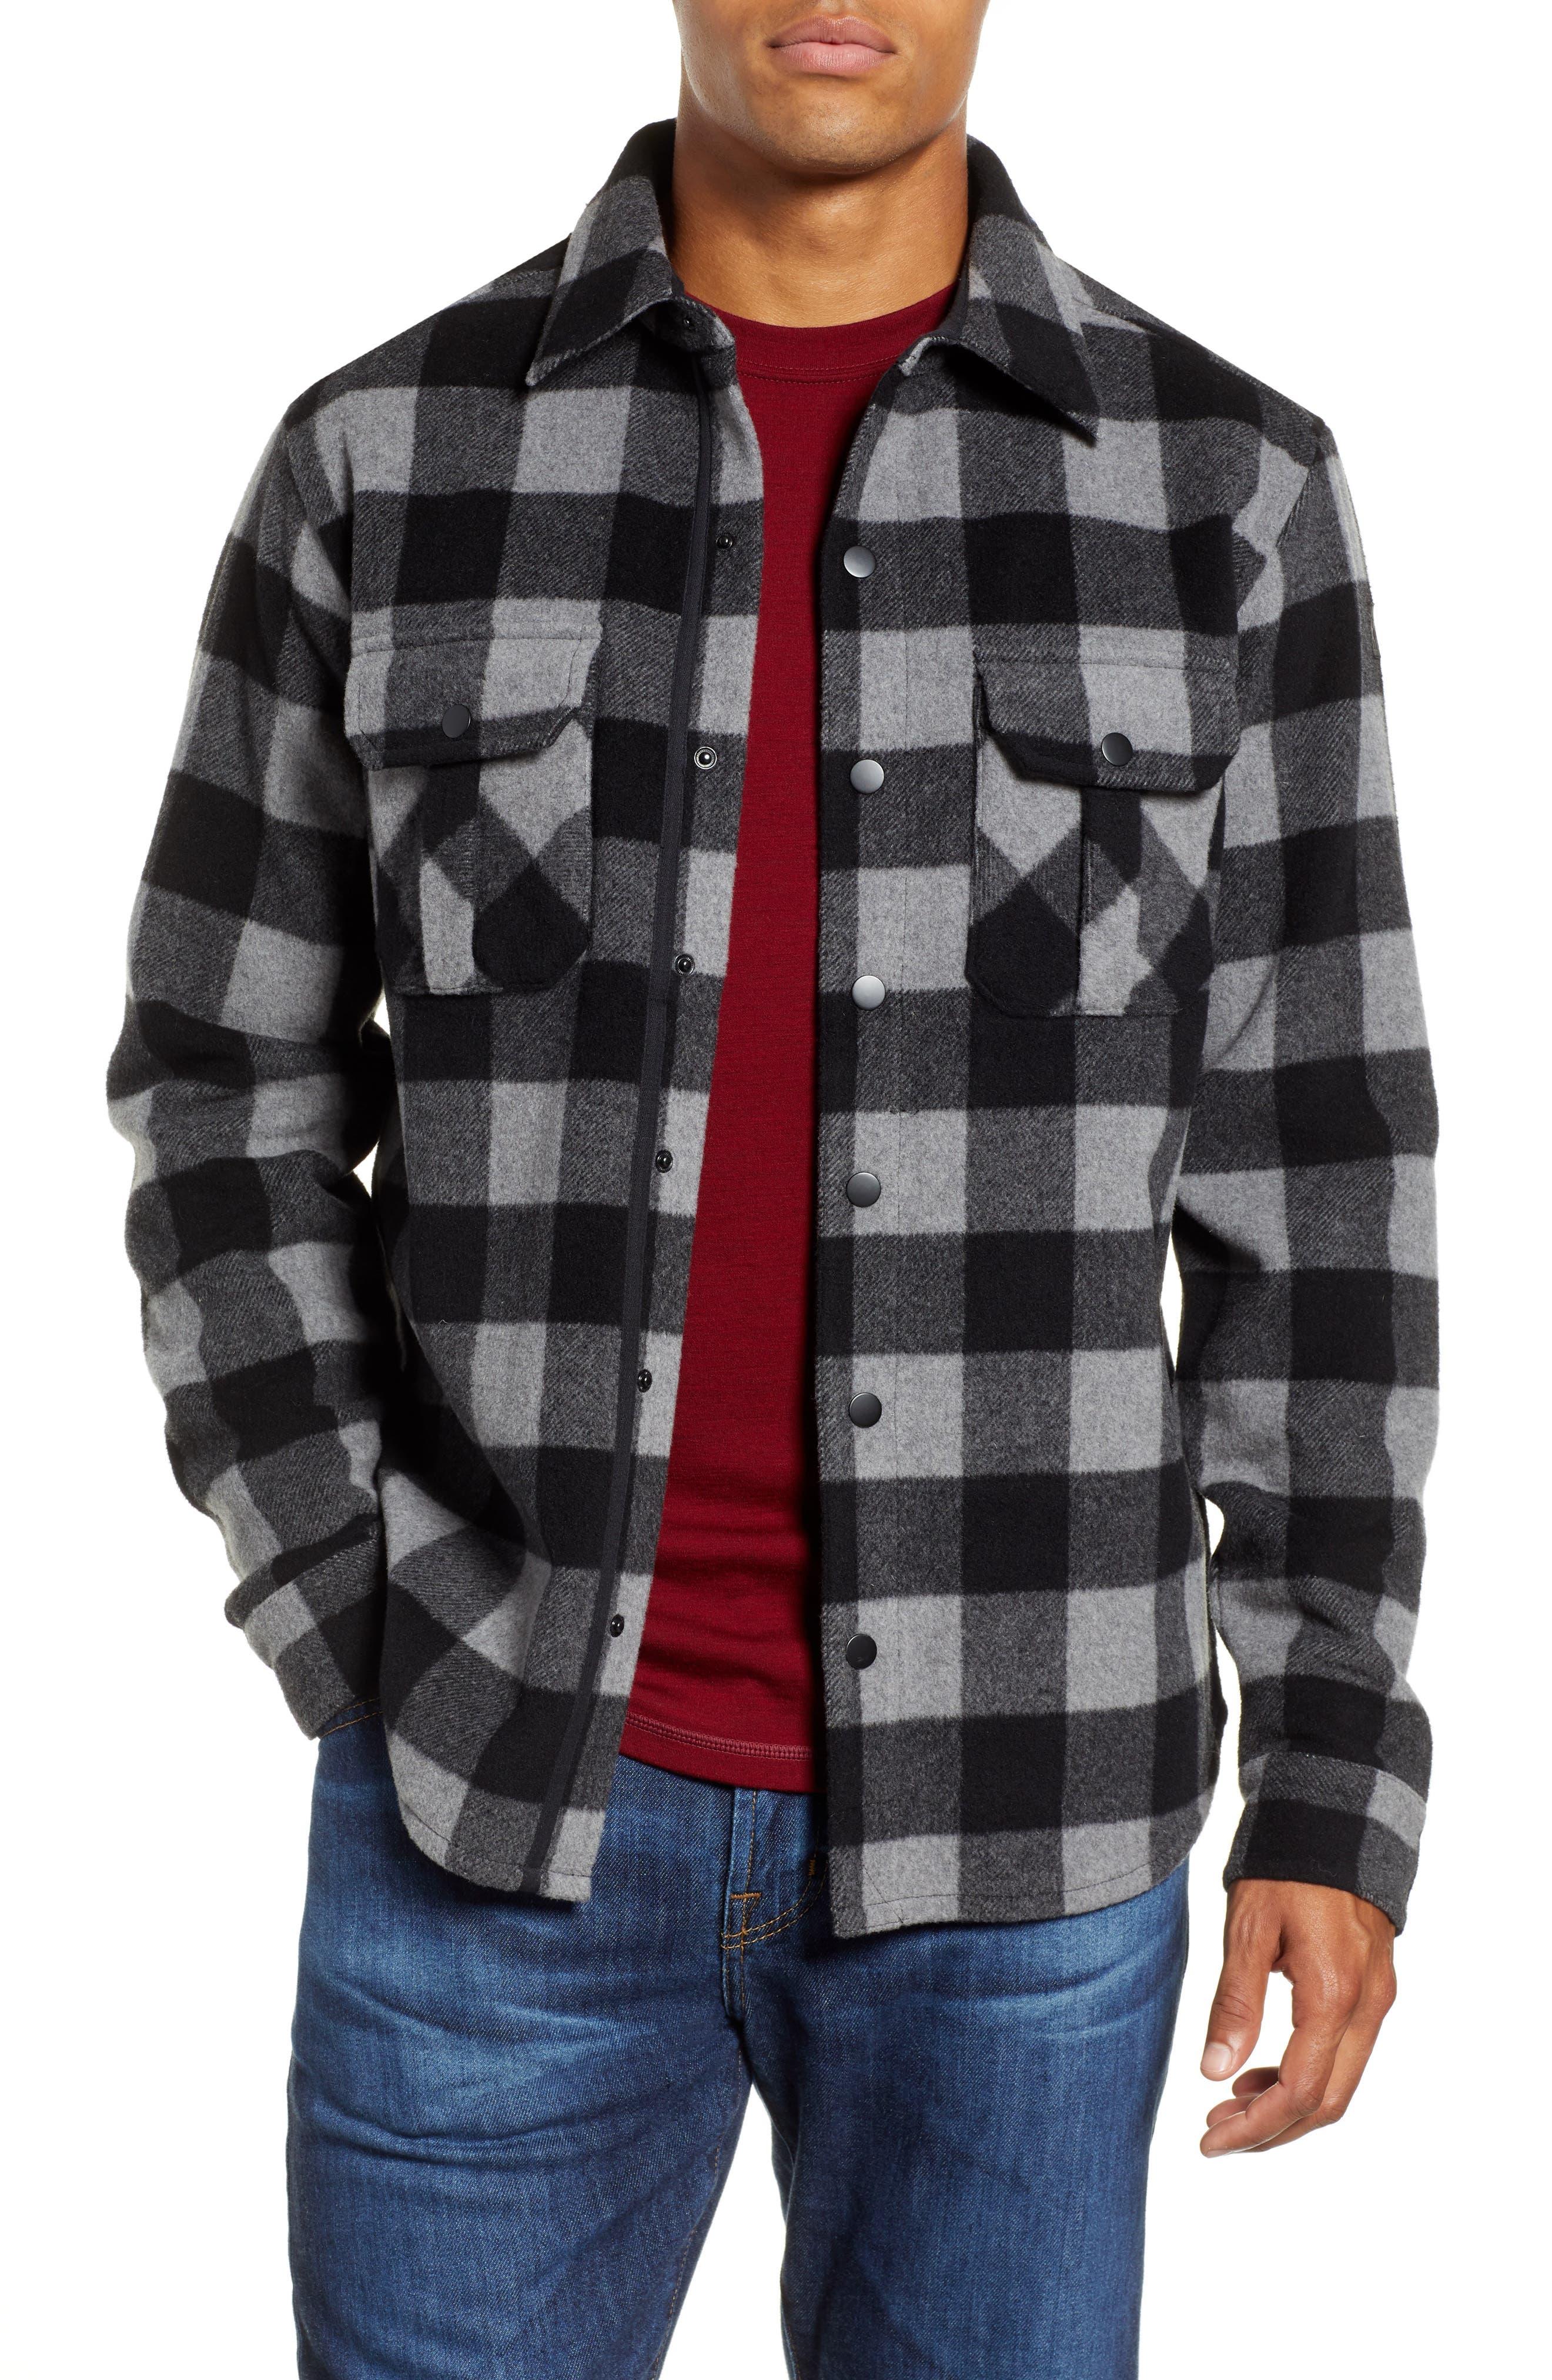 Anchor Line Flannel Shirt Jacket,                             Main thumbnail 1, color,                             MEDIUM GREY